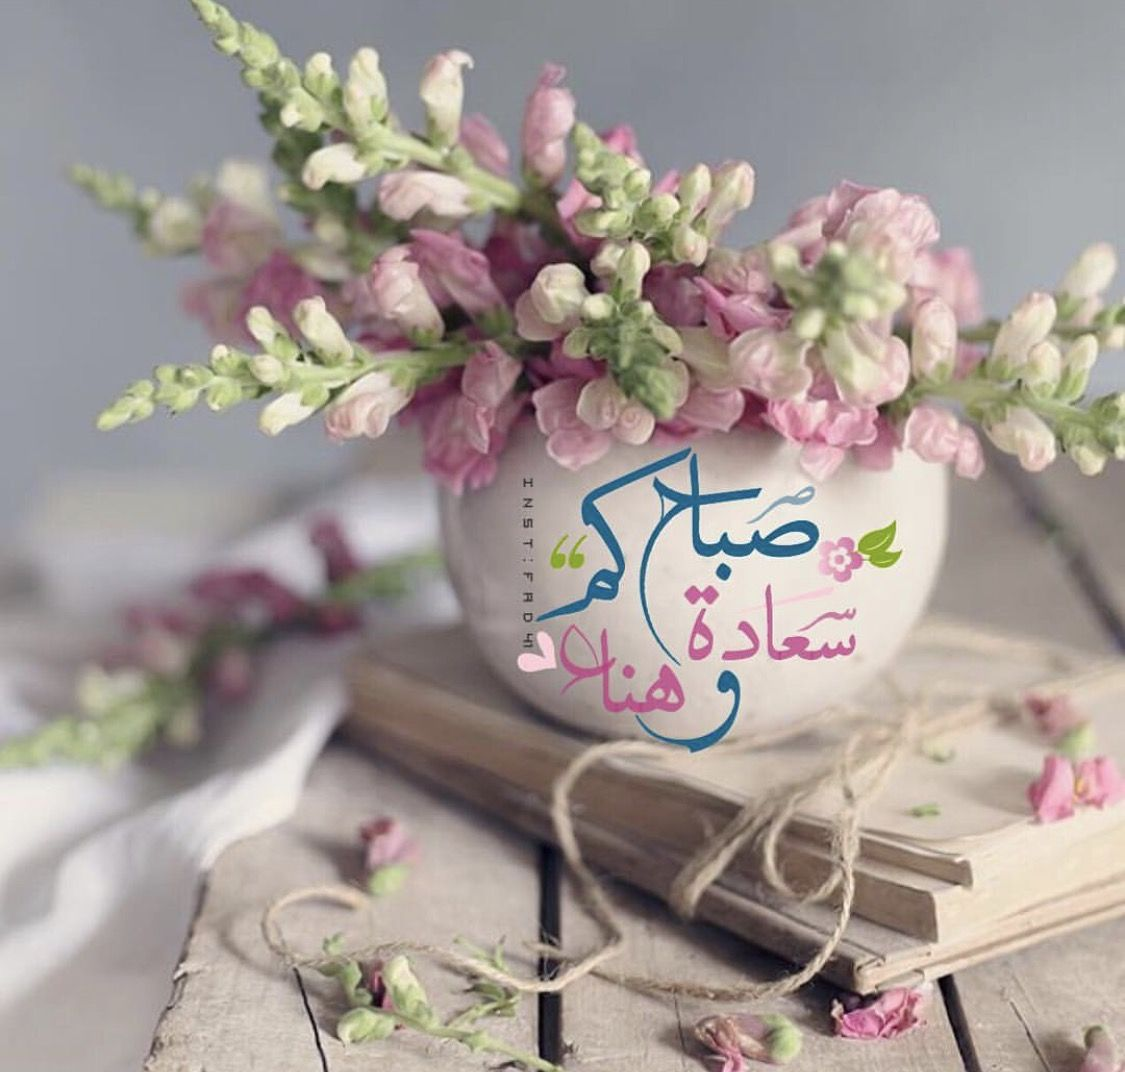 صباح الورد Beautiful Morning Messages Good Morning Arabic Morning Greeting